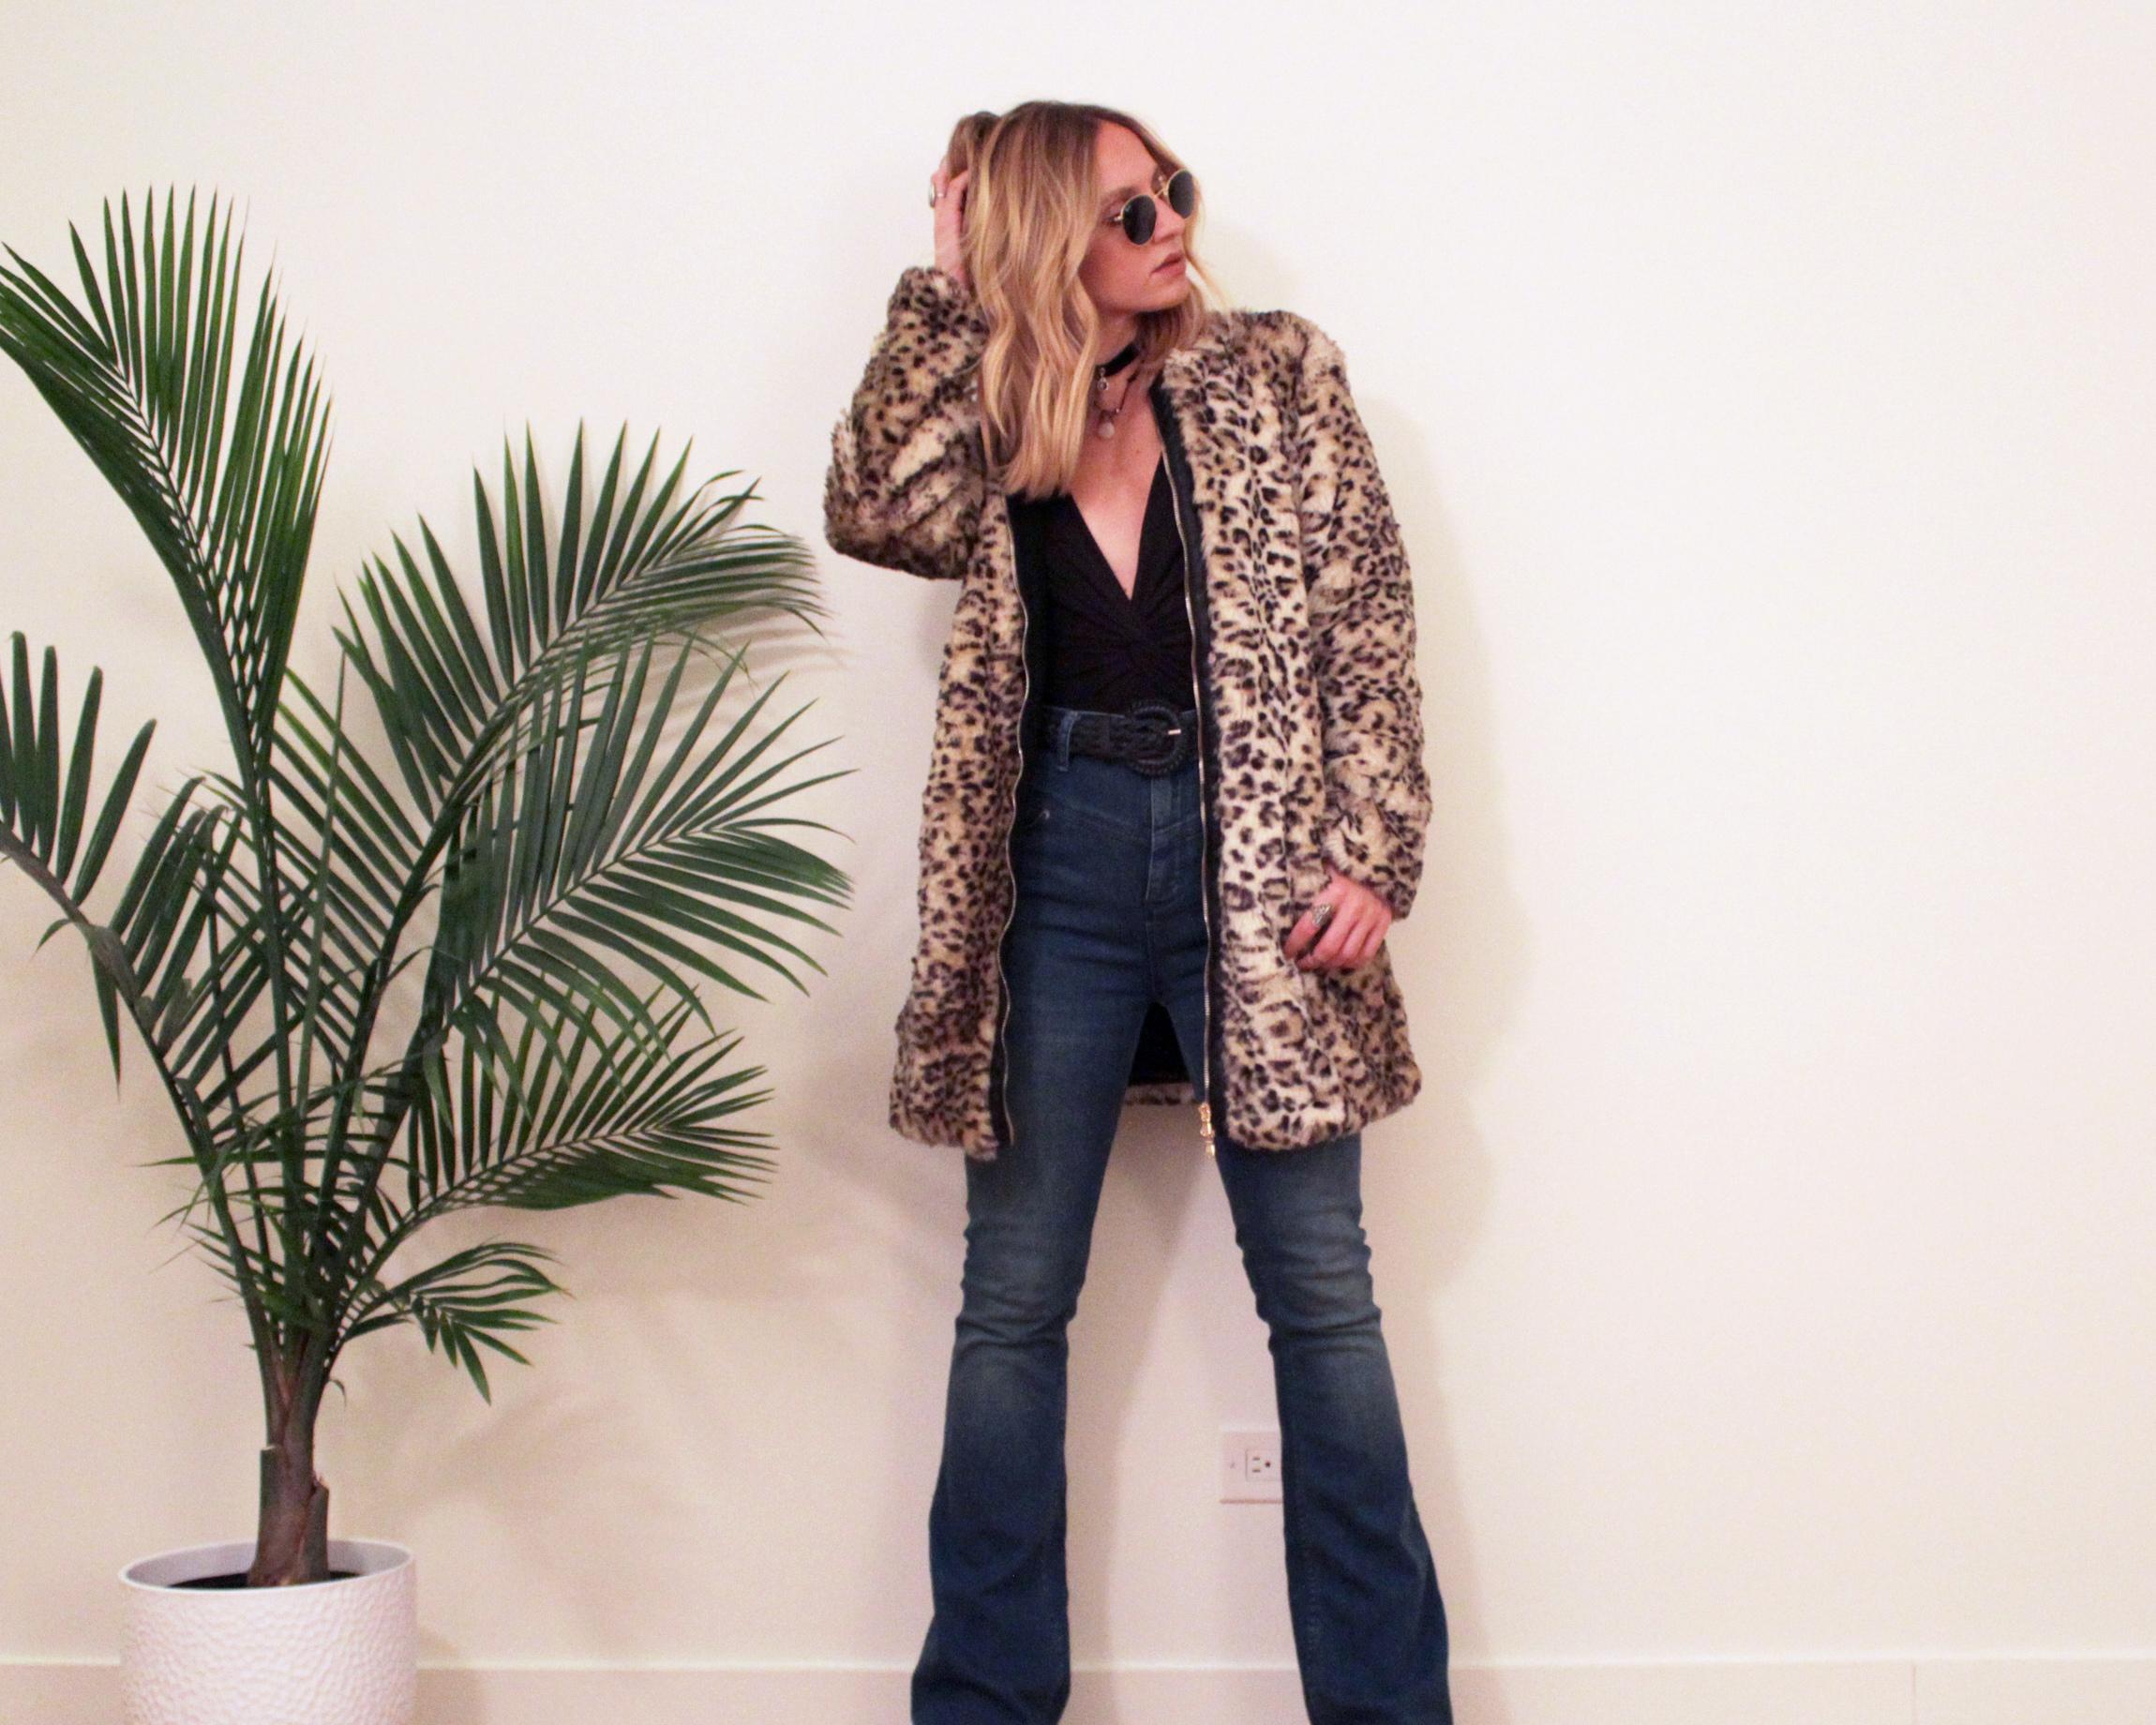 retro style leopard faux fur bell-bottoms